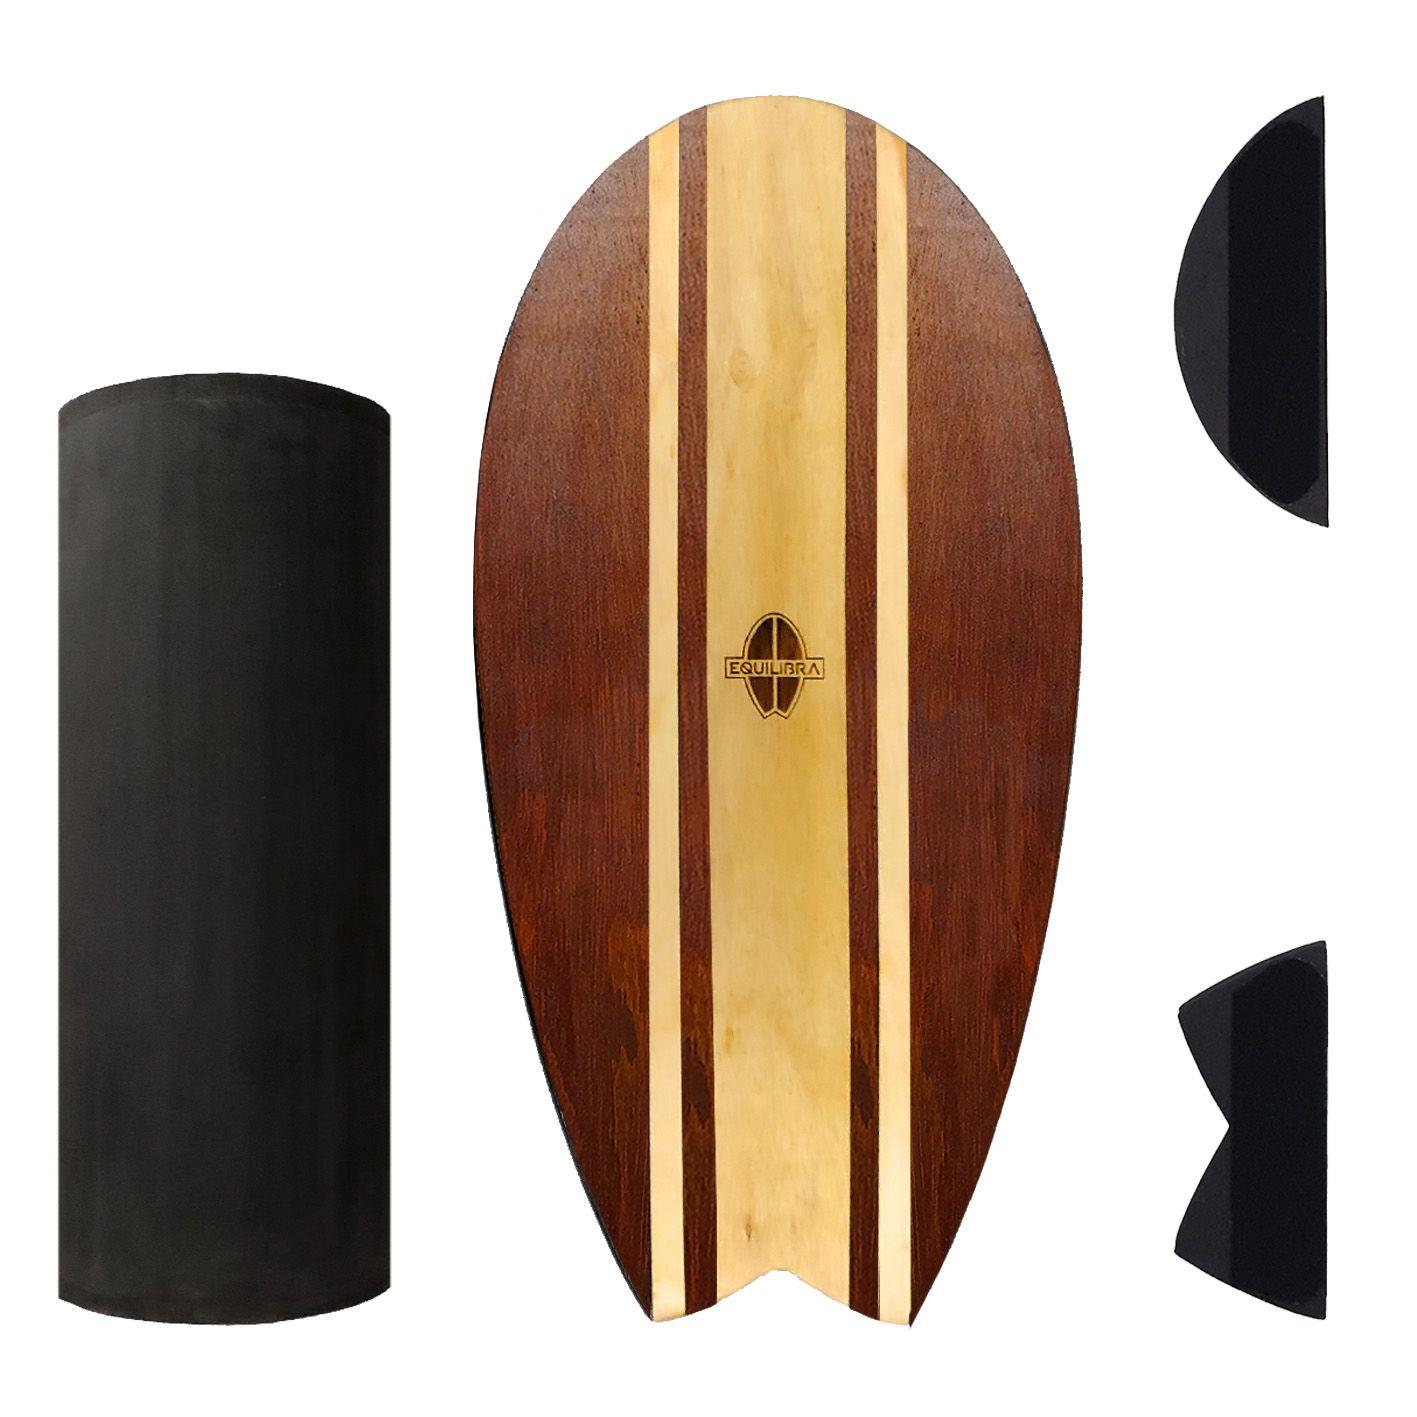 Kit Equilibra - Modelo Clássico